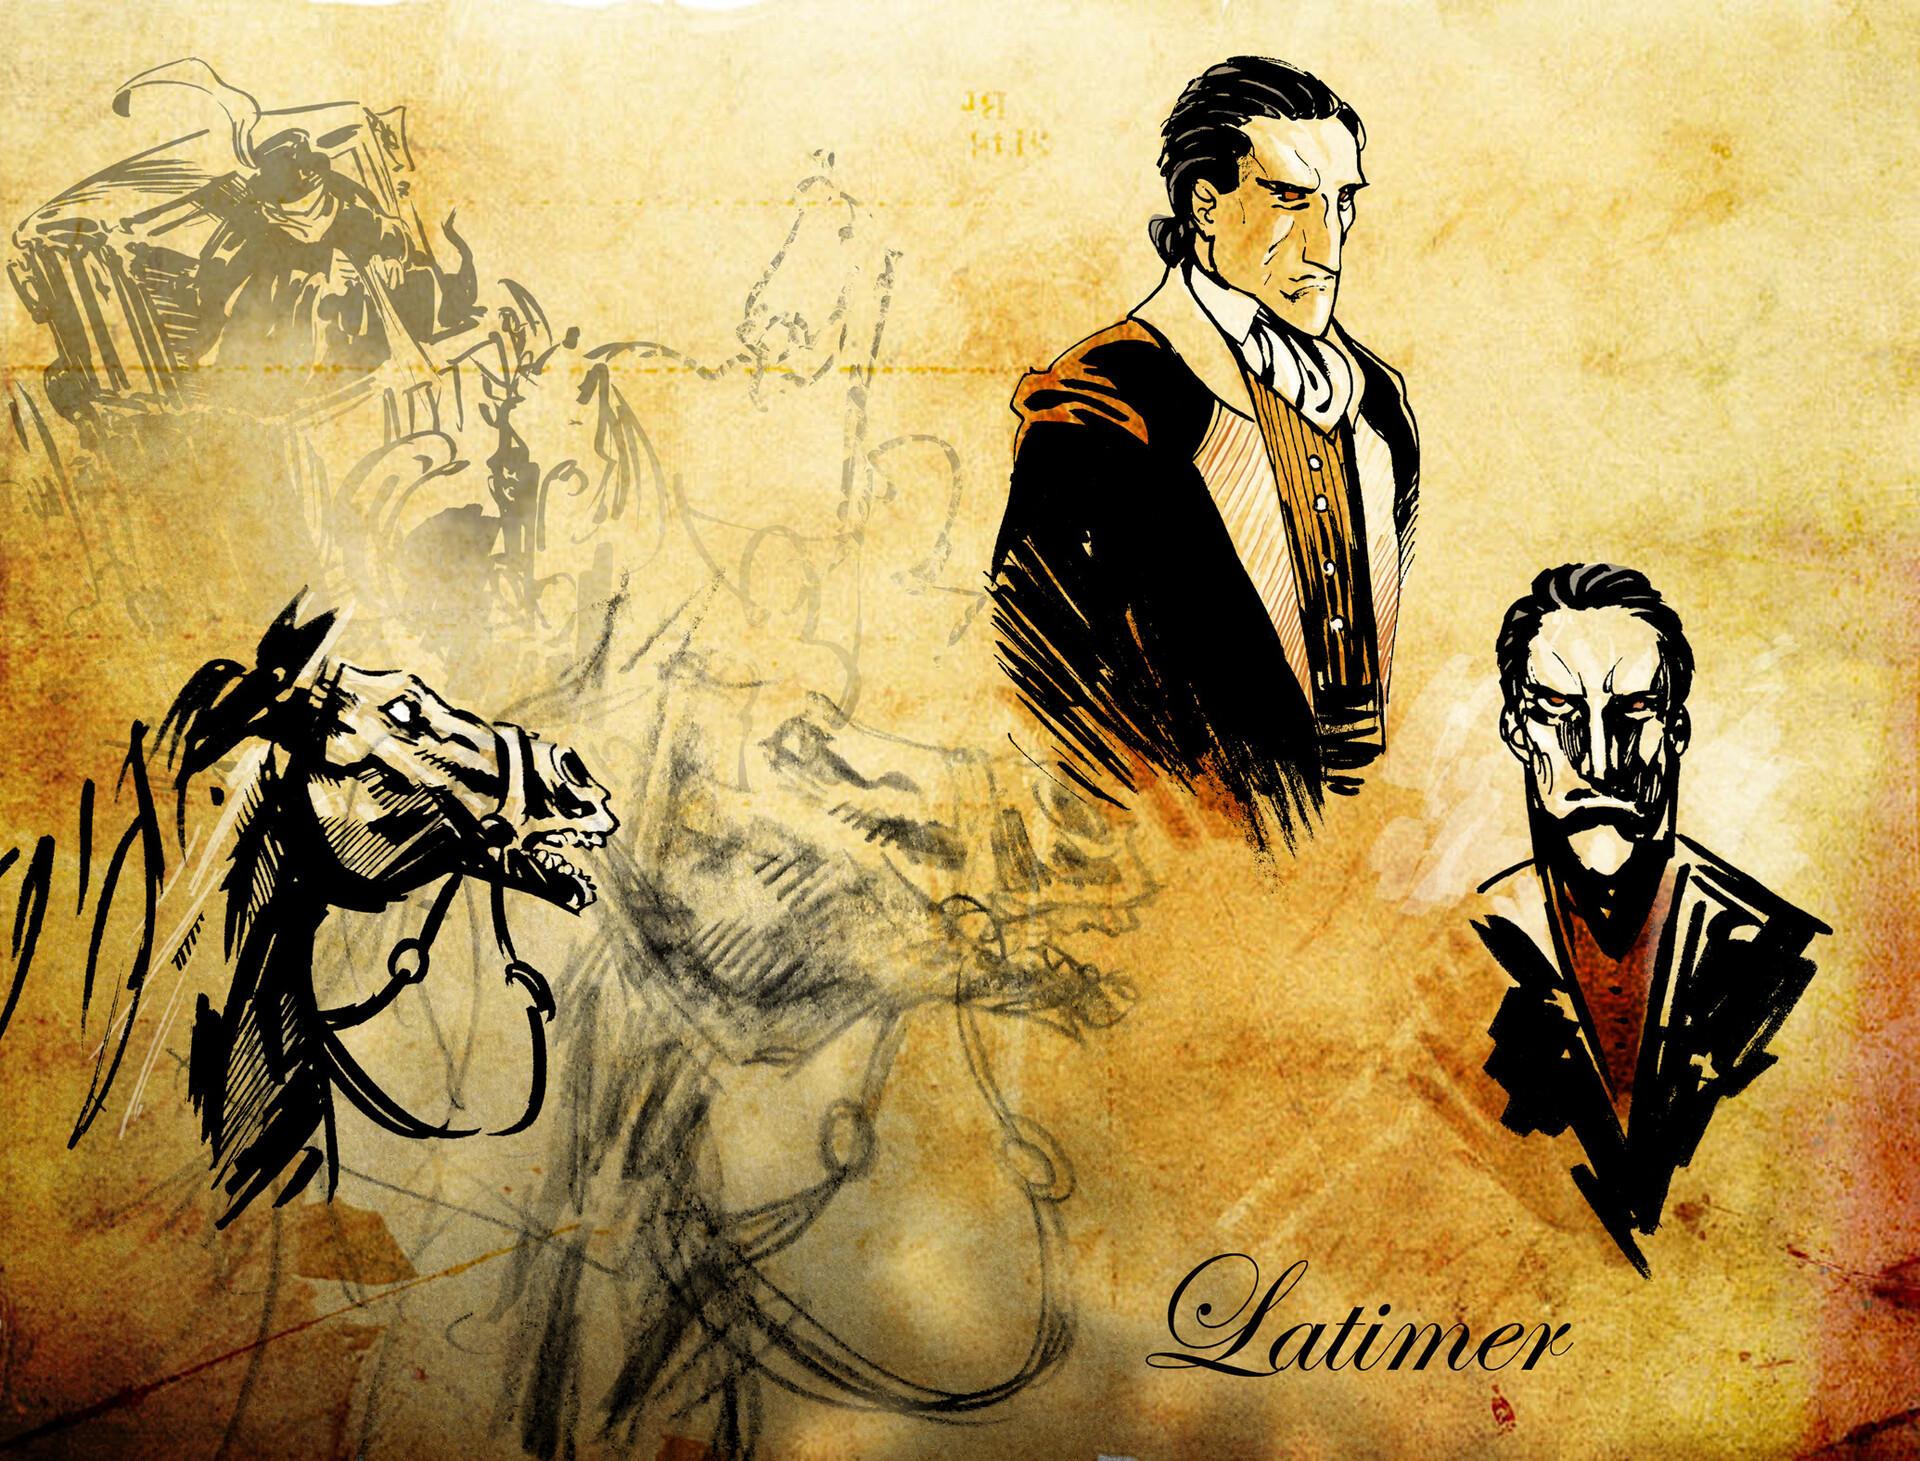 Latimer character design